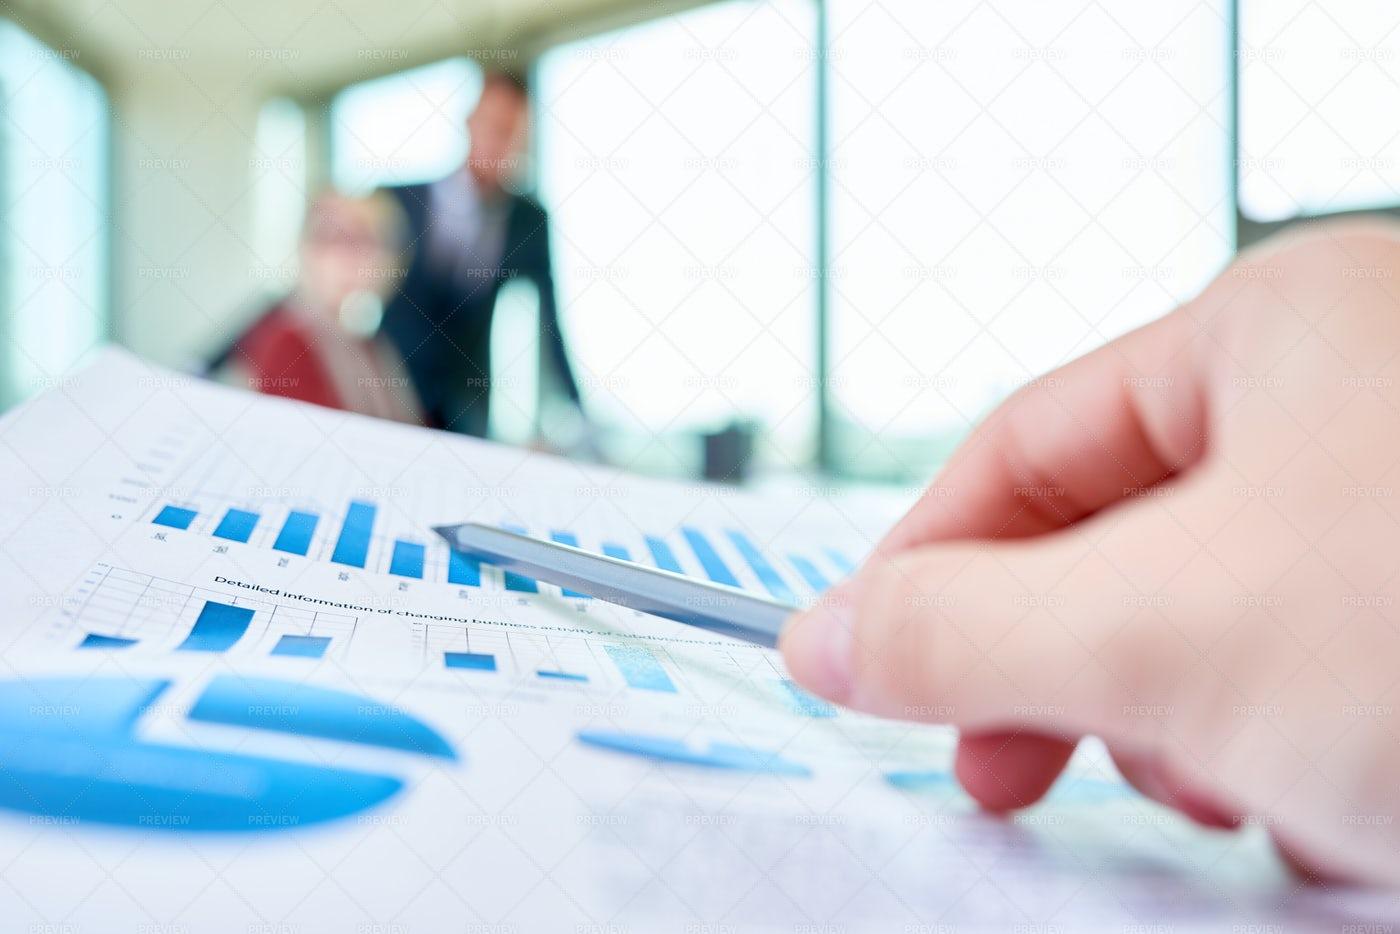 Studying Statistical Data: Stock Photos